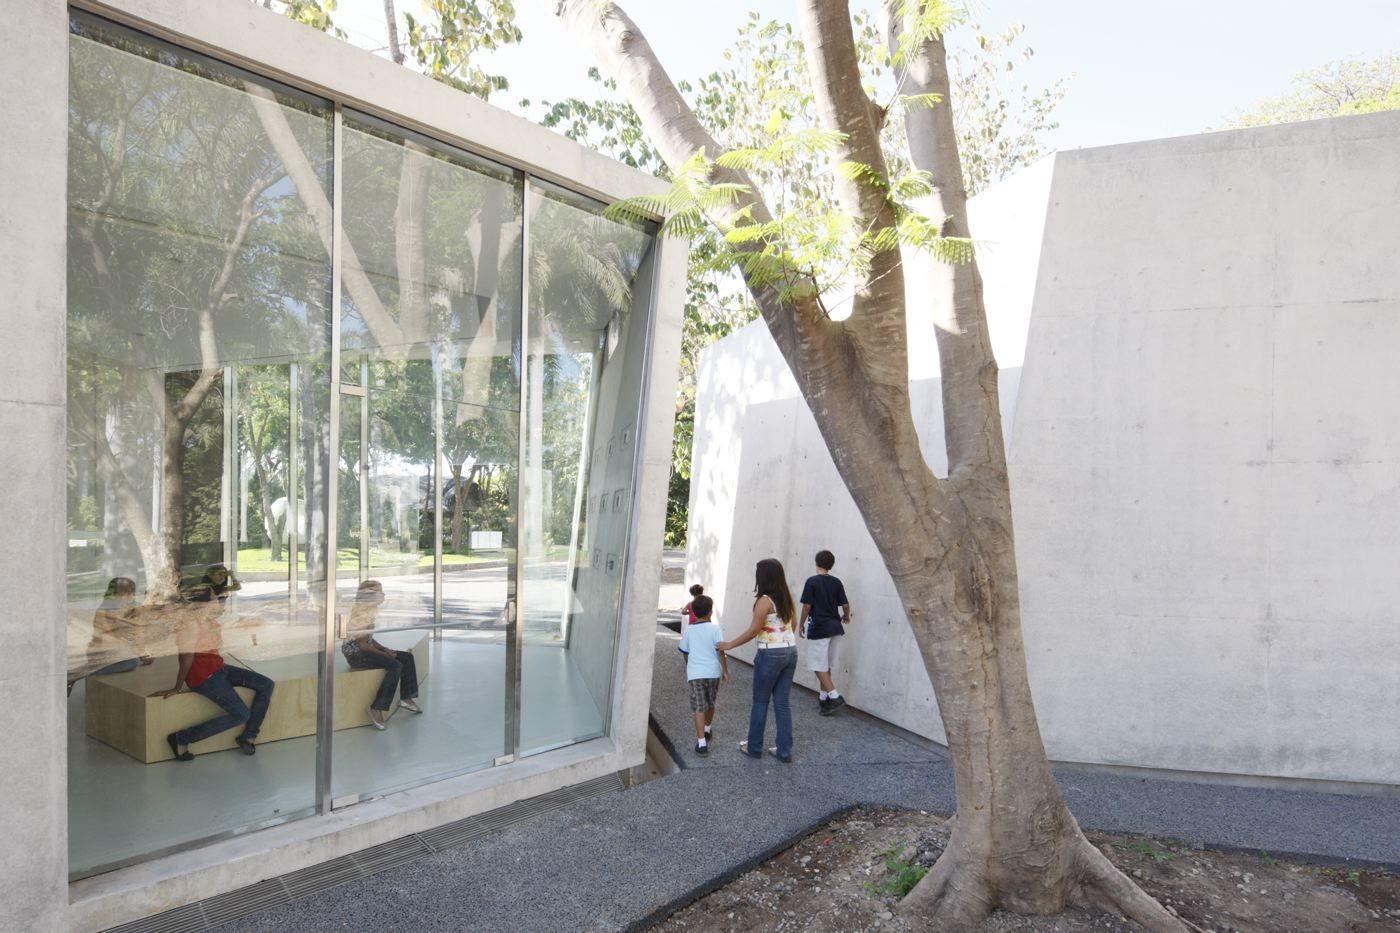 Tatiana bilbao tag plataforma arquitectura - Colegio arquitectos bilbao ...